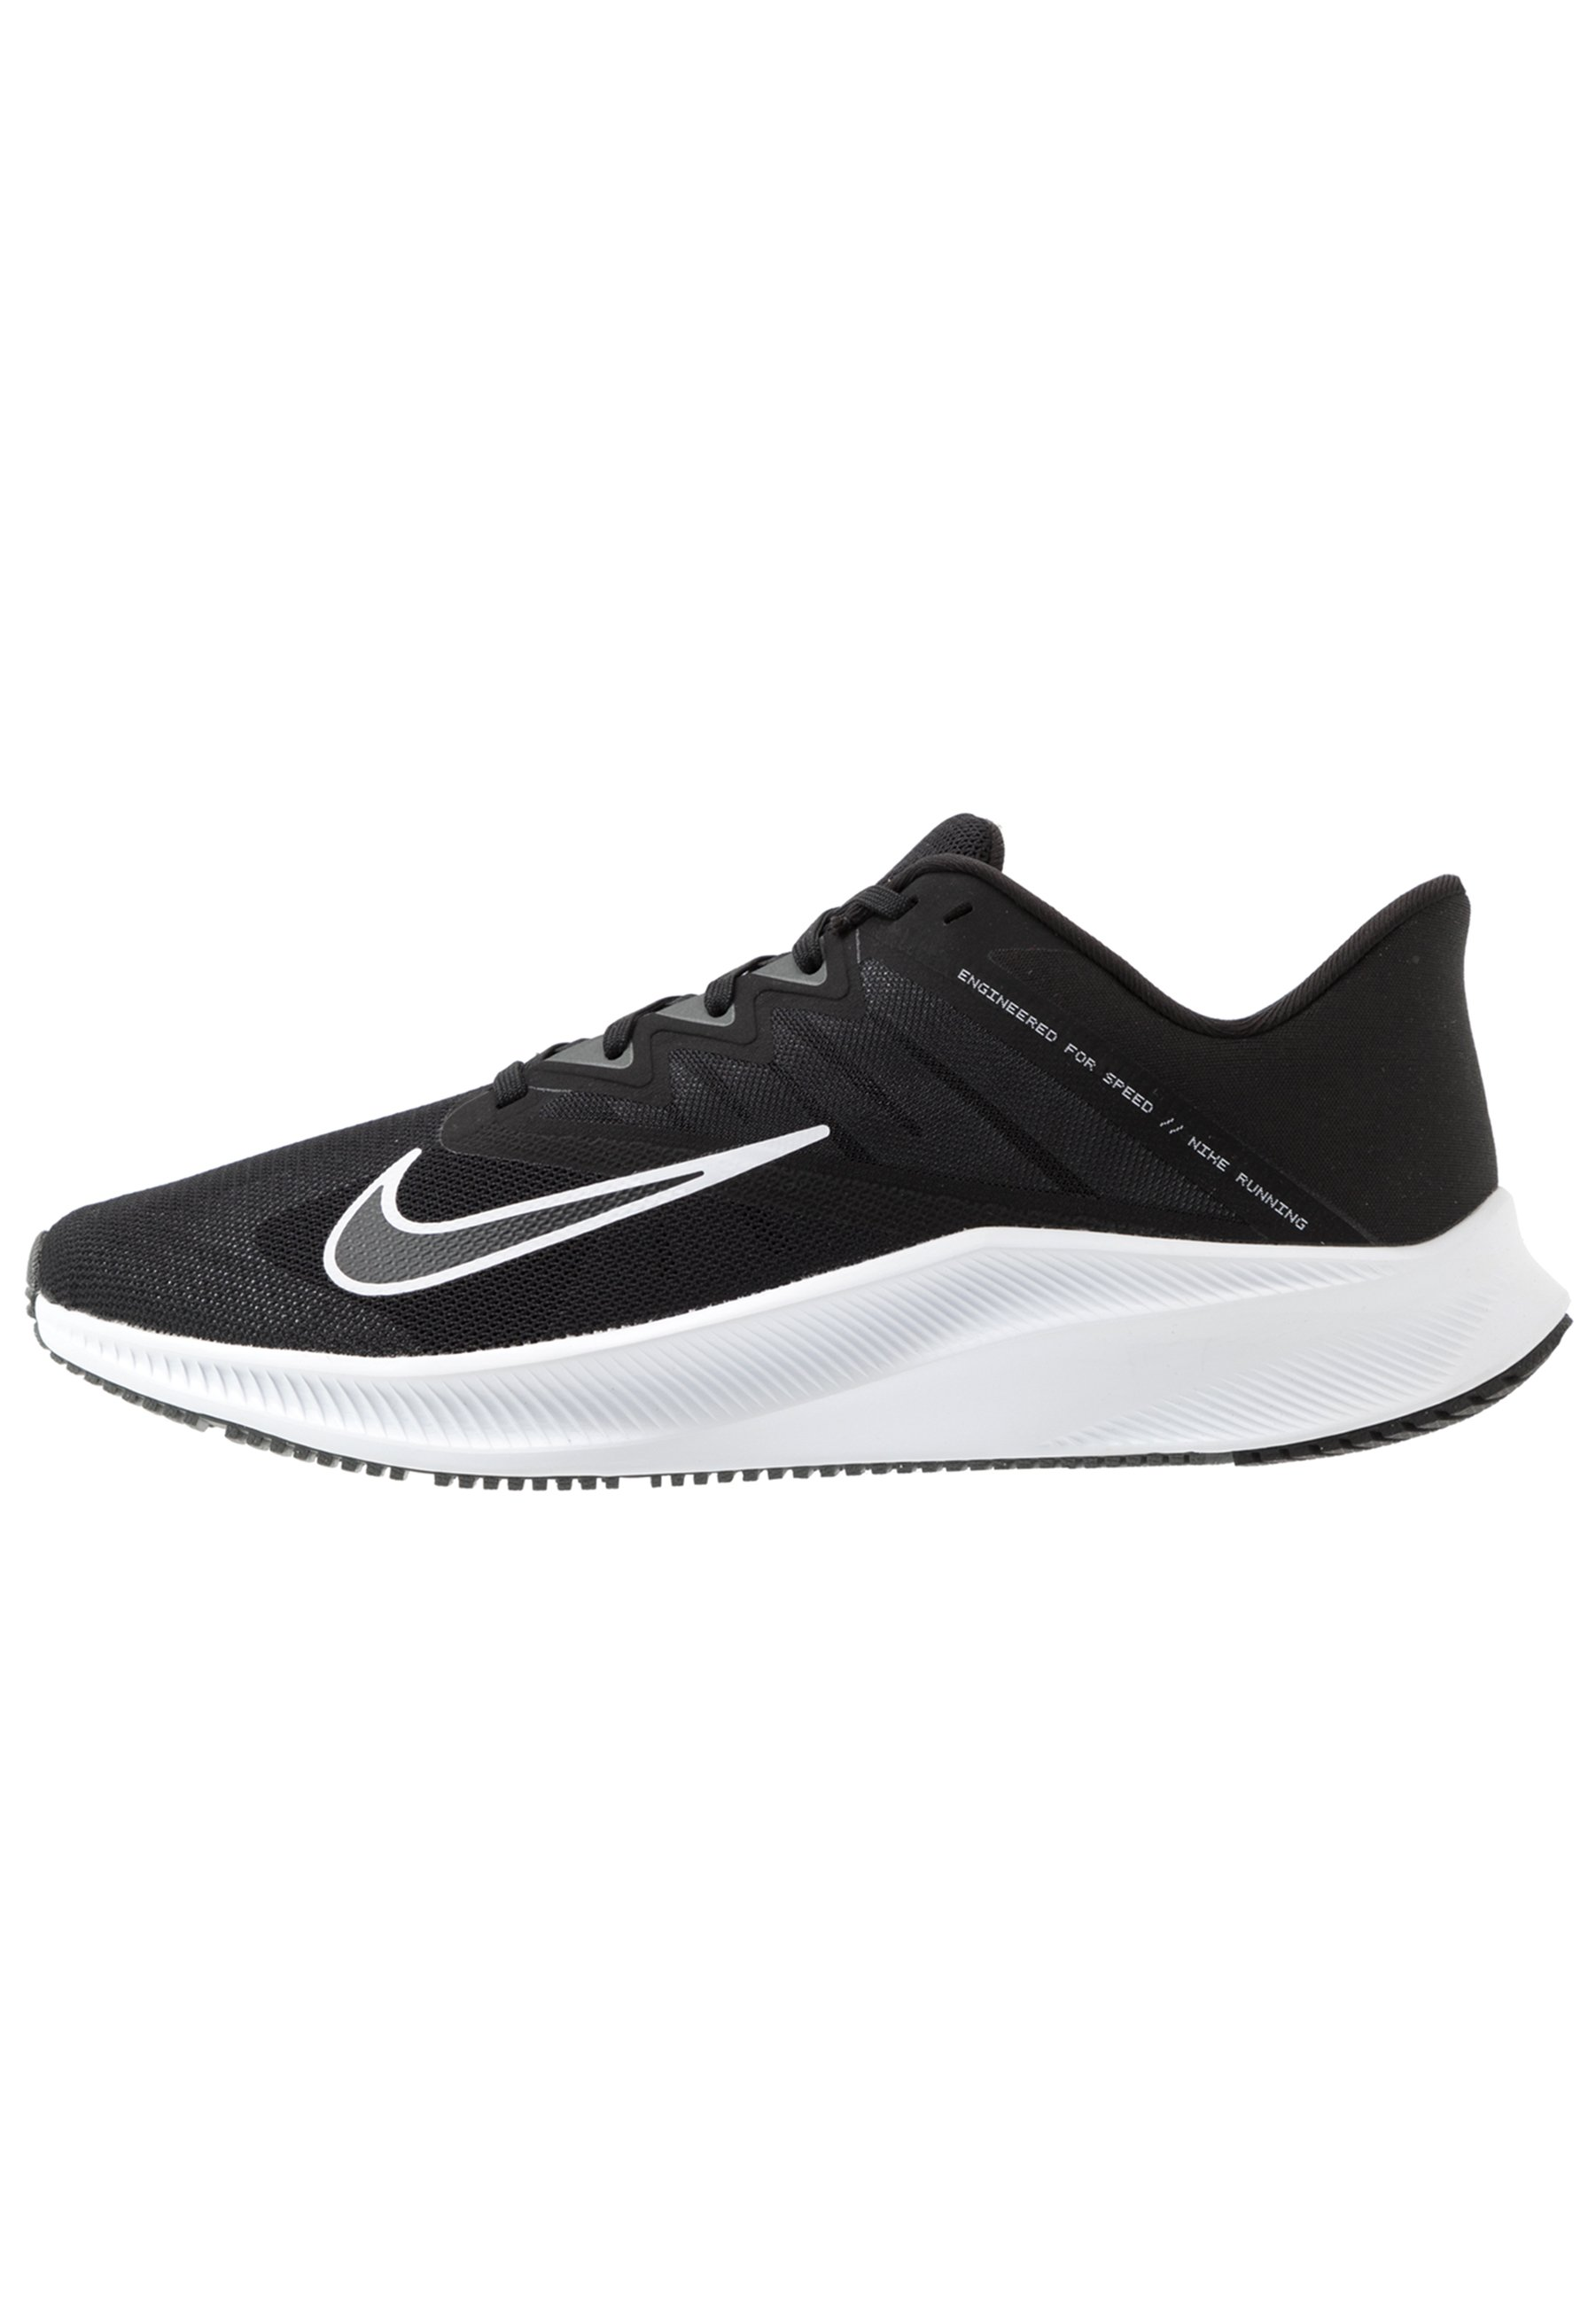 QUEST 3 Chaussures de running neutres blackwhiteiron grey